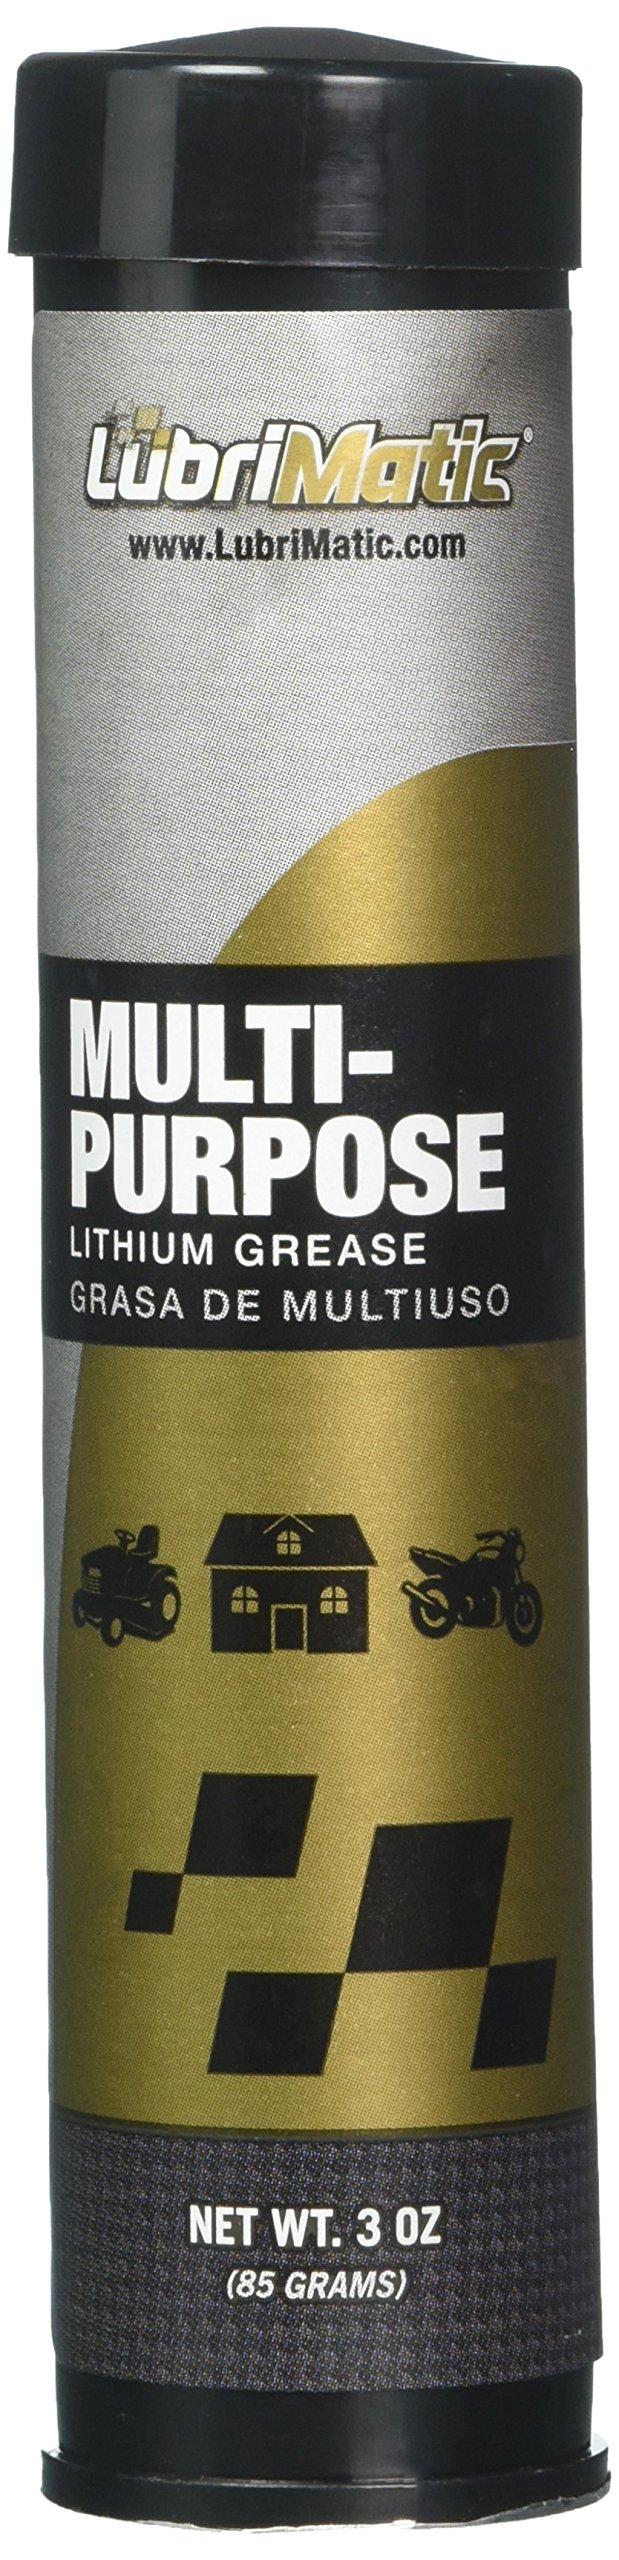 LubriMatic 11312 3 Pack Multi-Purpose Lithium Mini' Grease Guns (3oz. Cartridges), 3